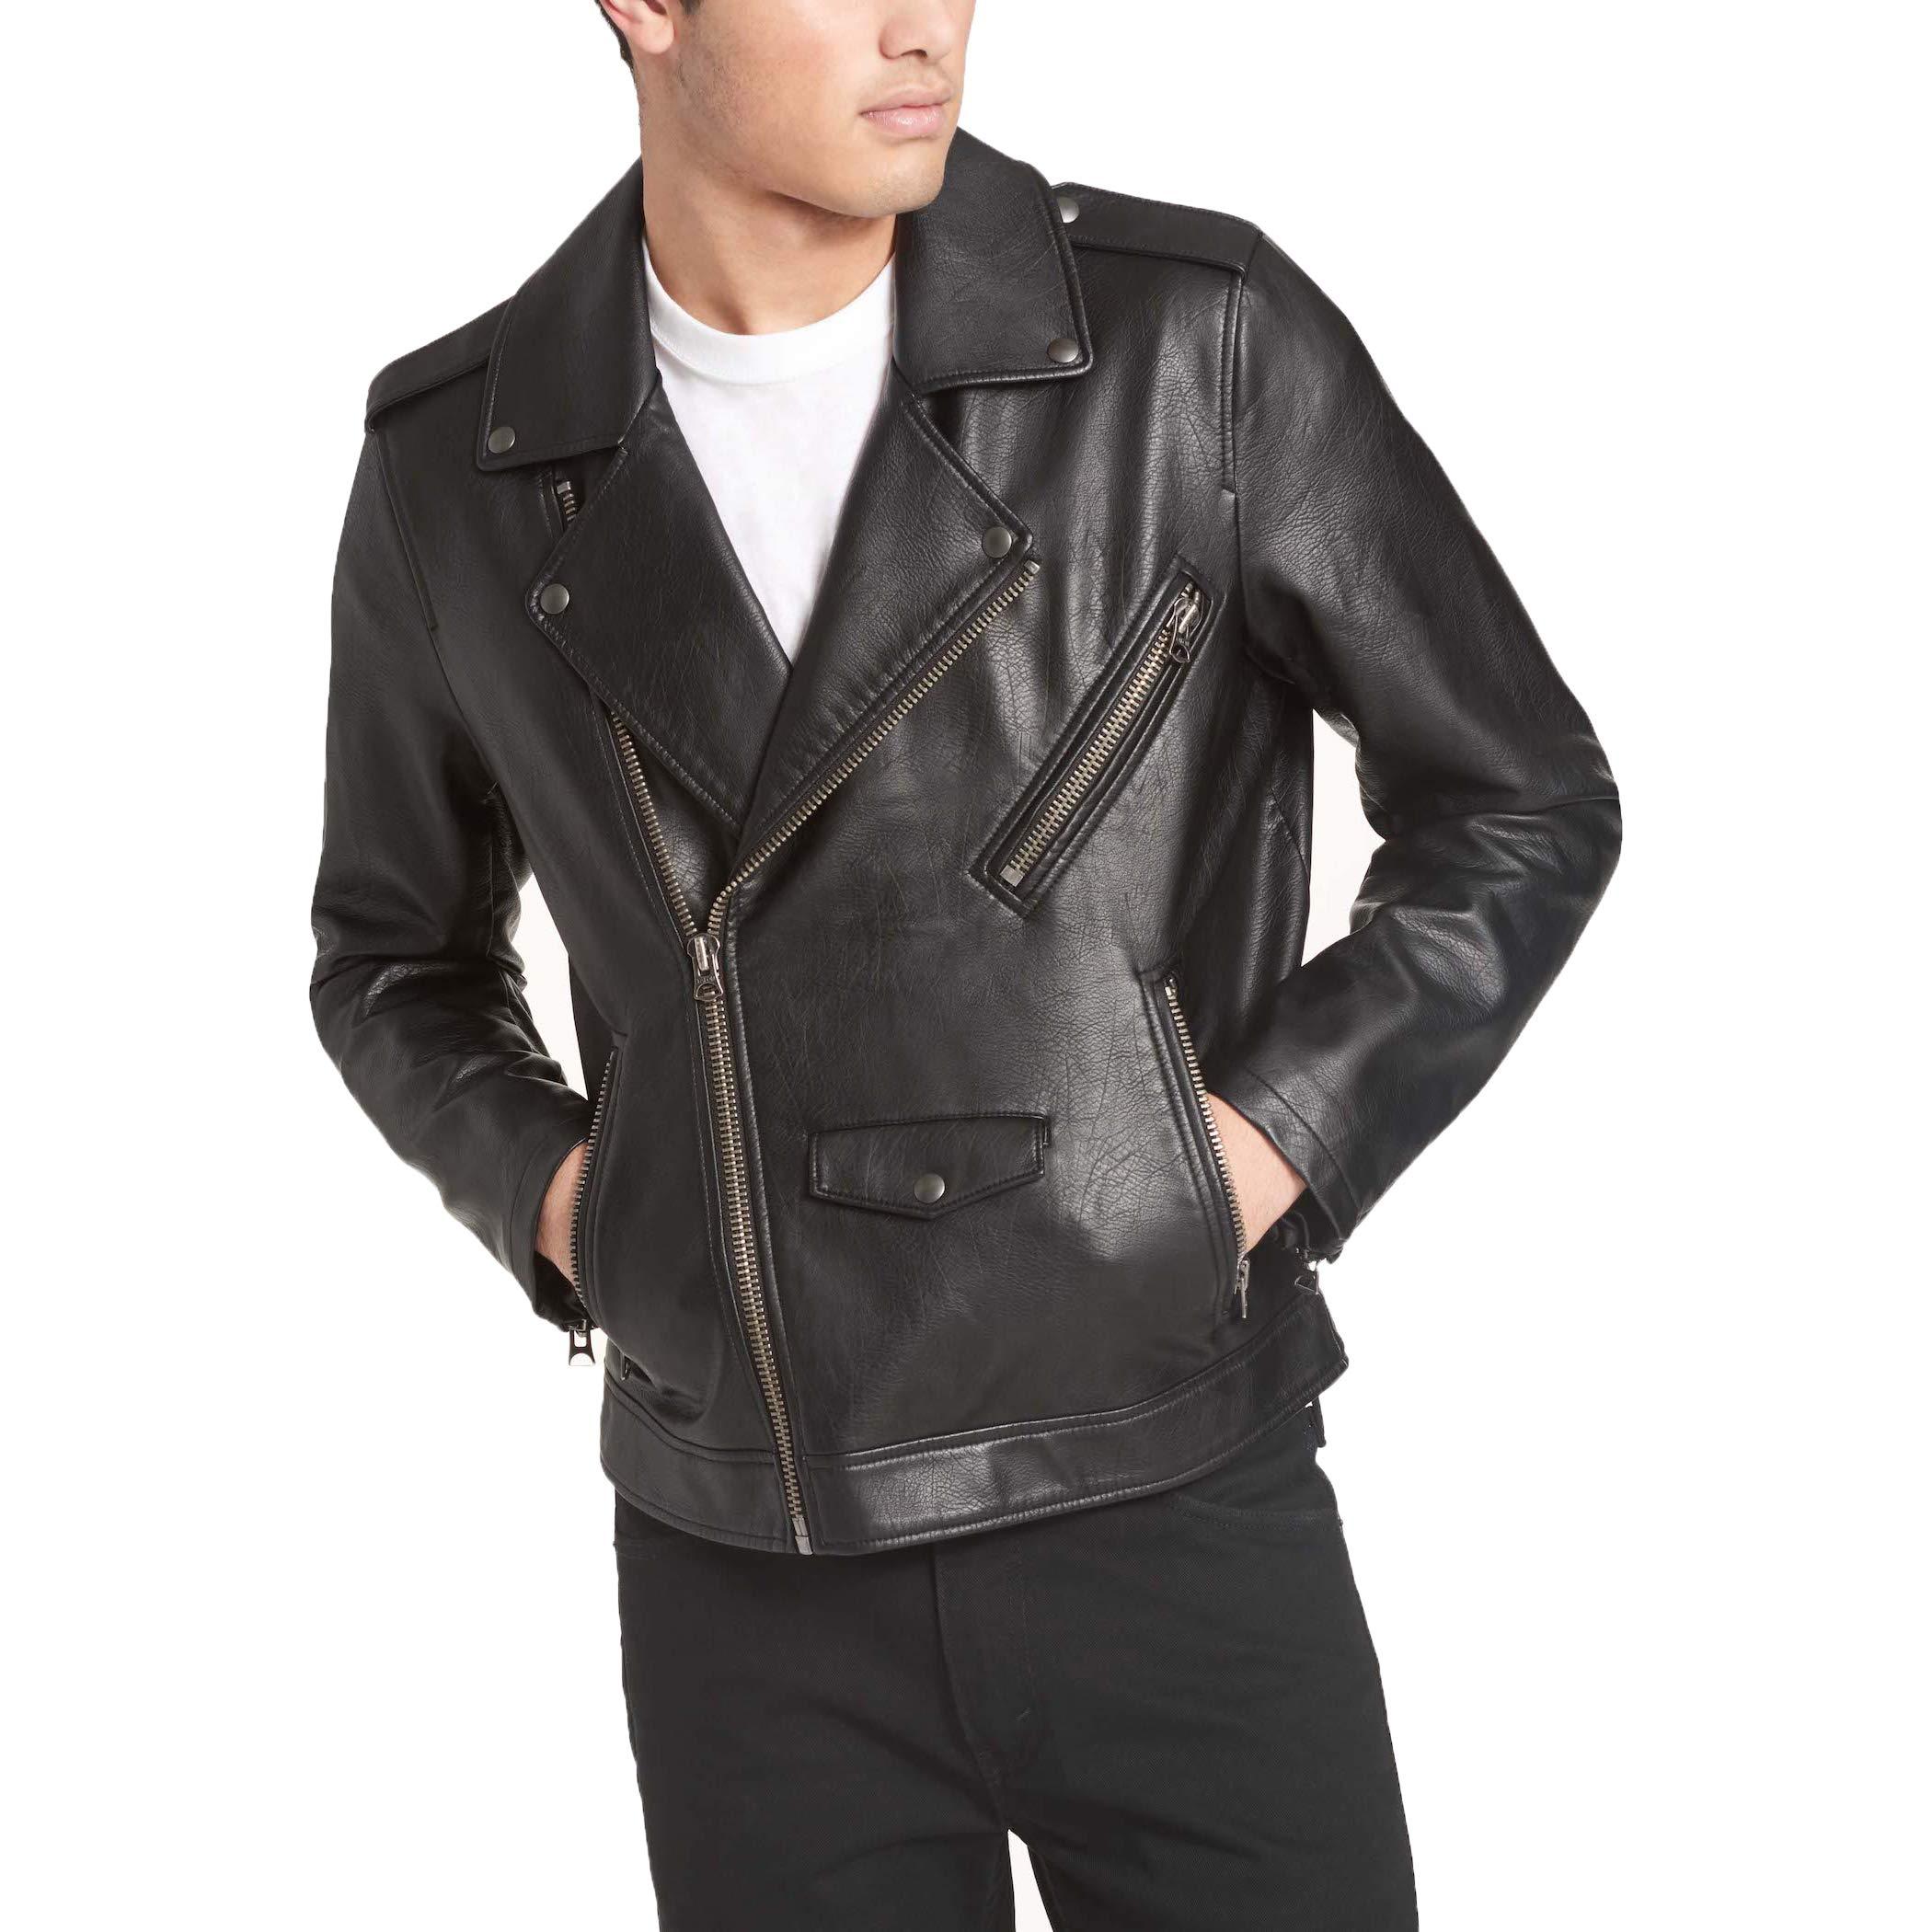 Levi's Men's Faux Leather Motorcycle Jacket, Black, Large by Levi's